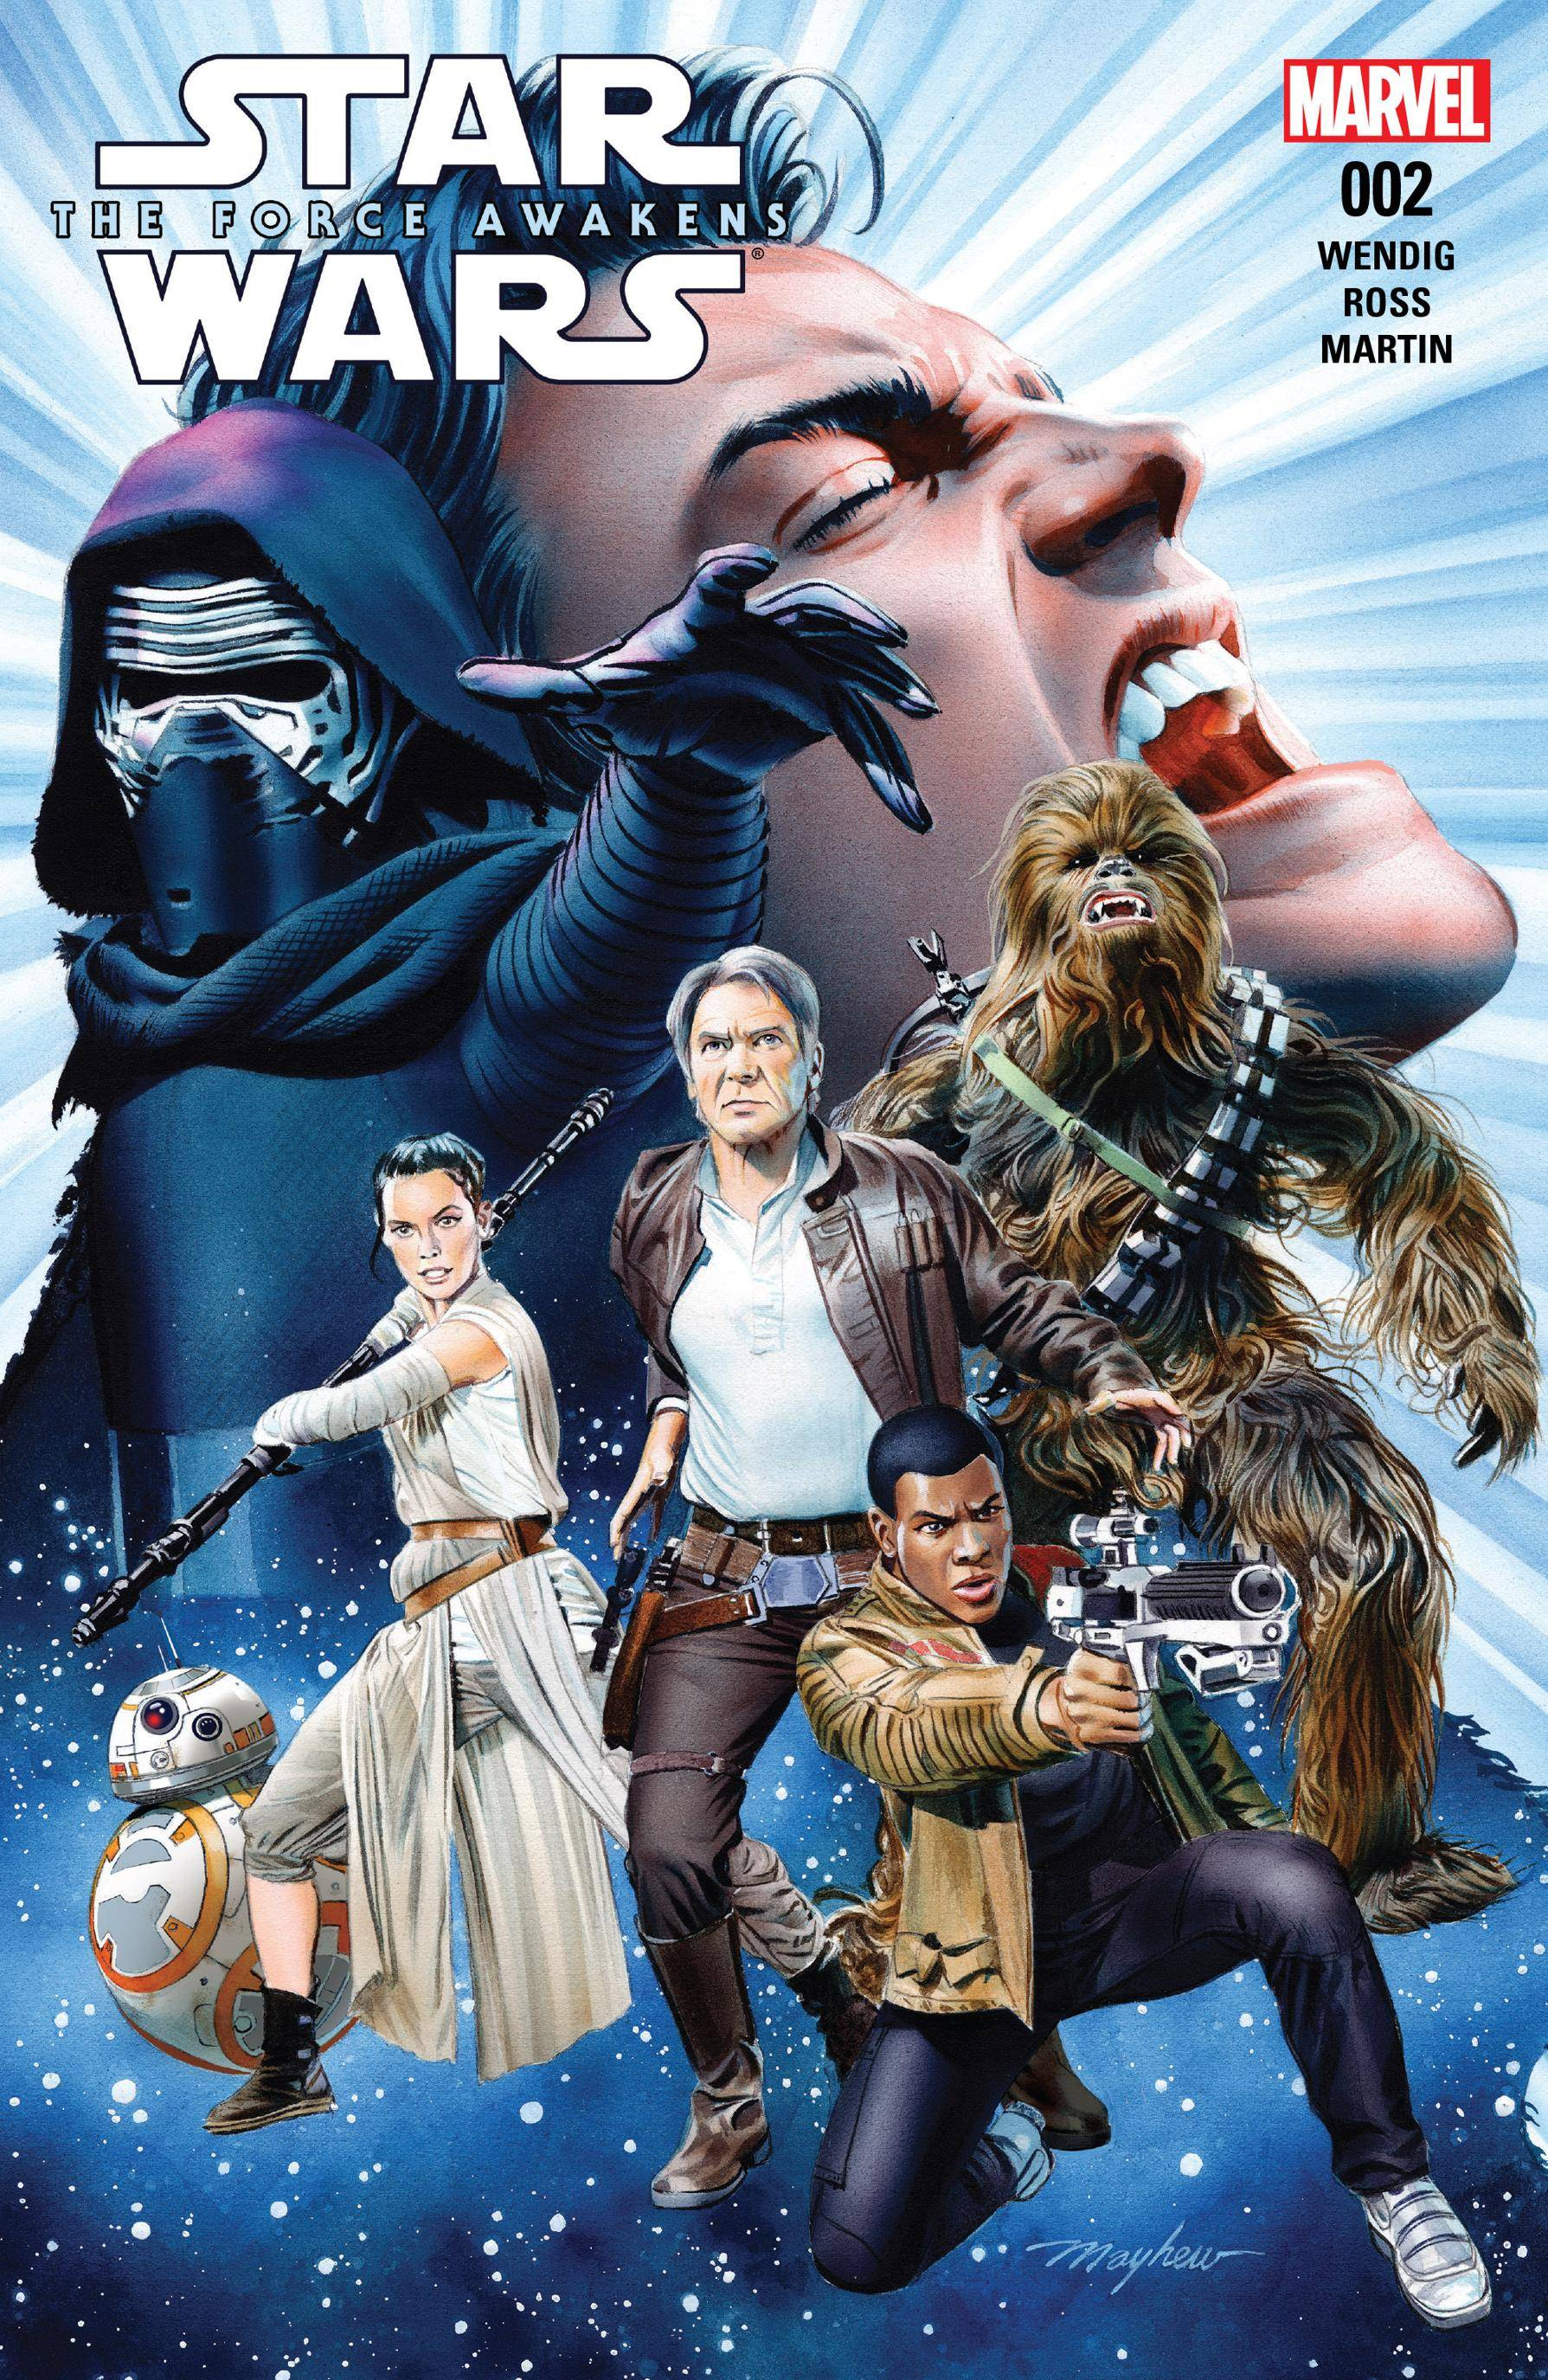 Star Wars - The Force Awakens Adaptation 002 2016 Digital Kileko-Empire